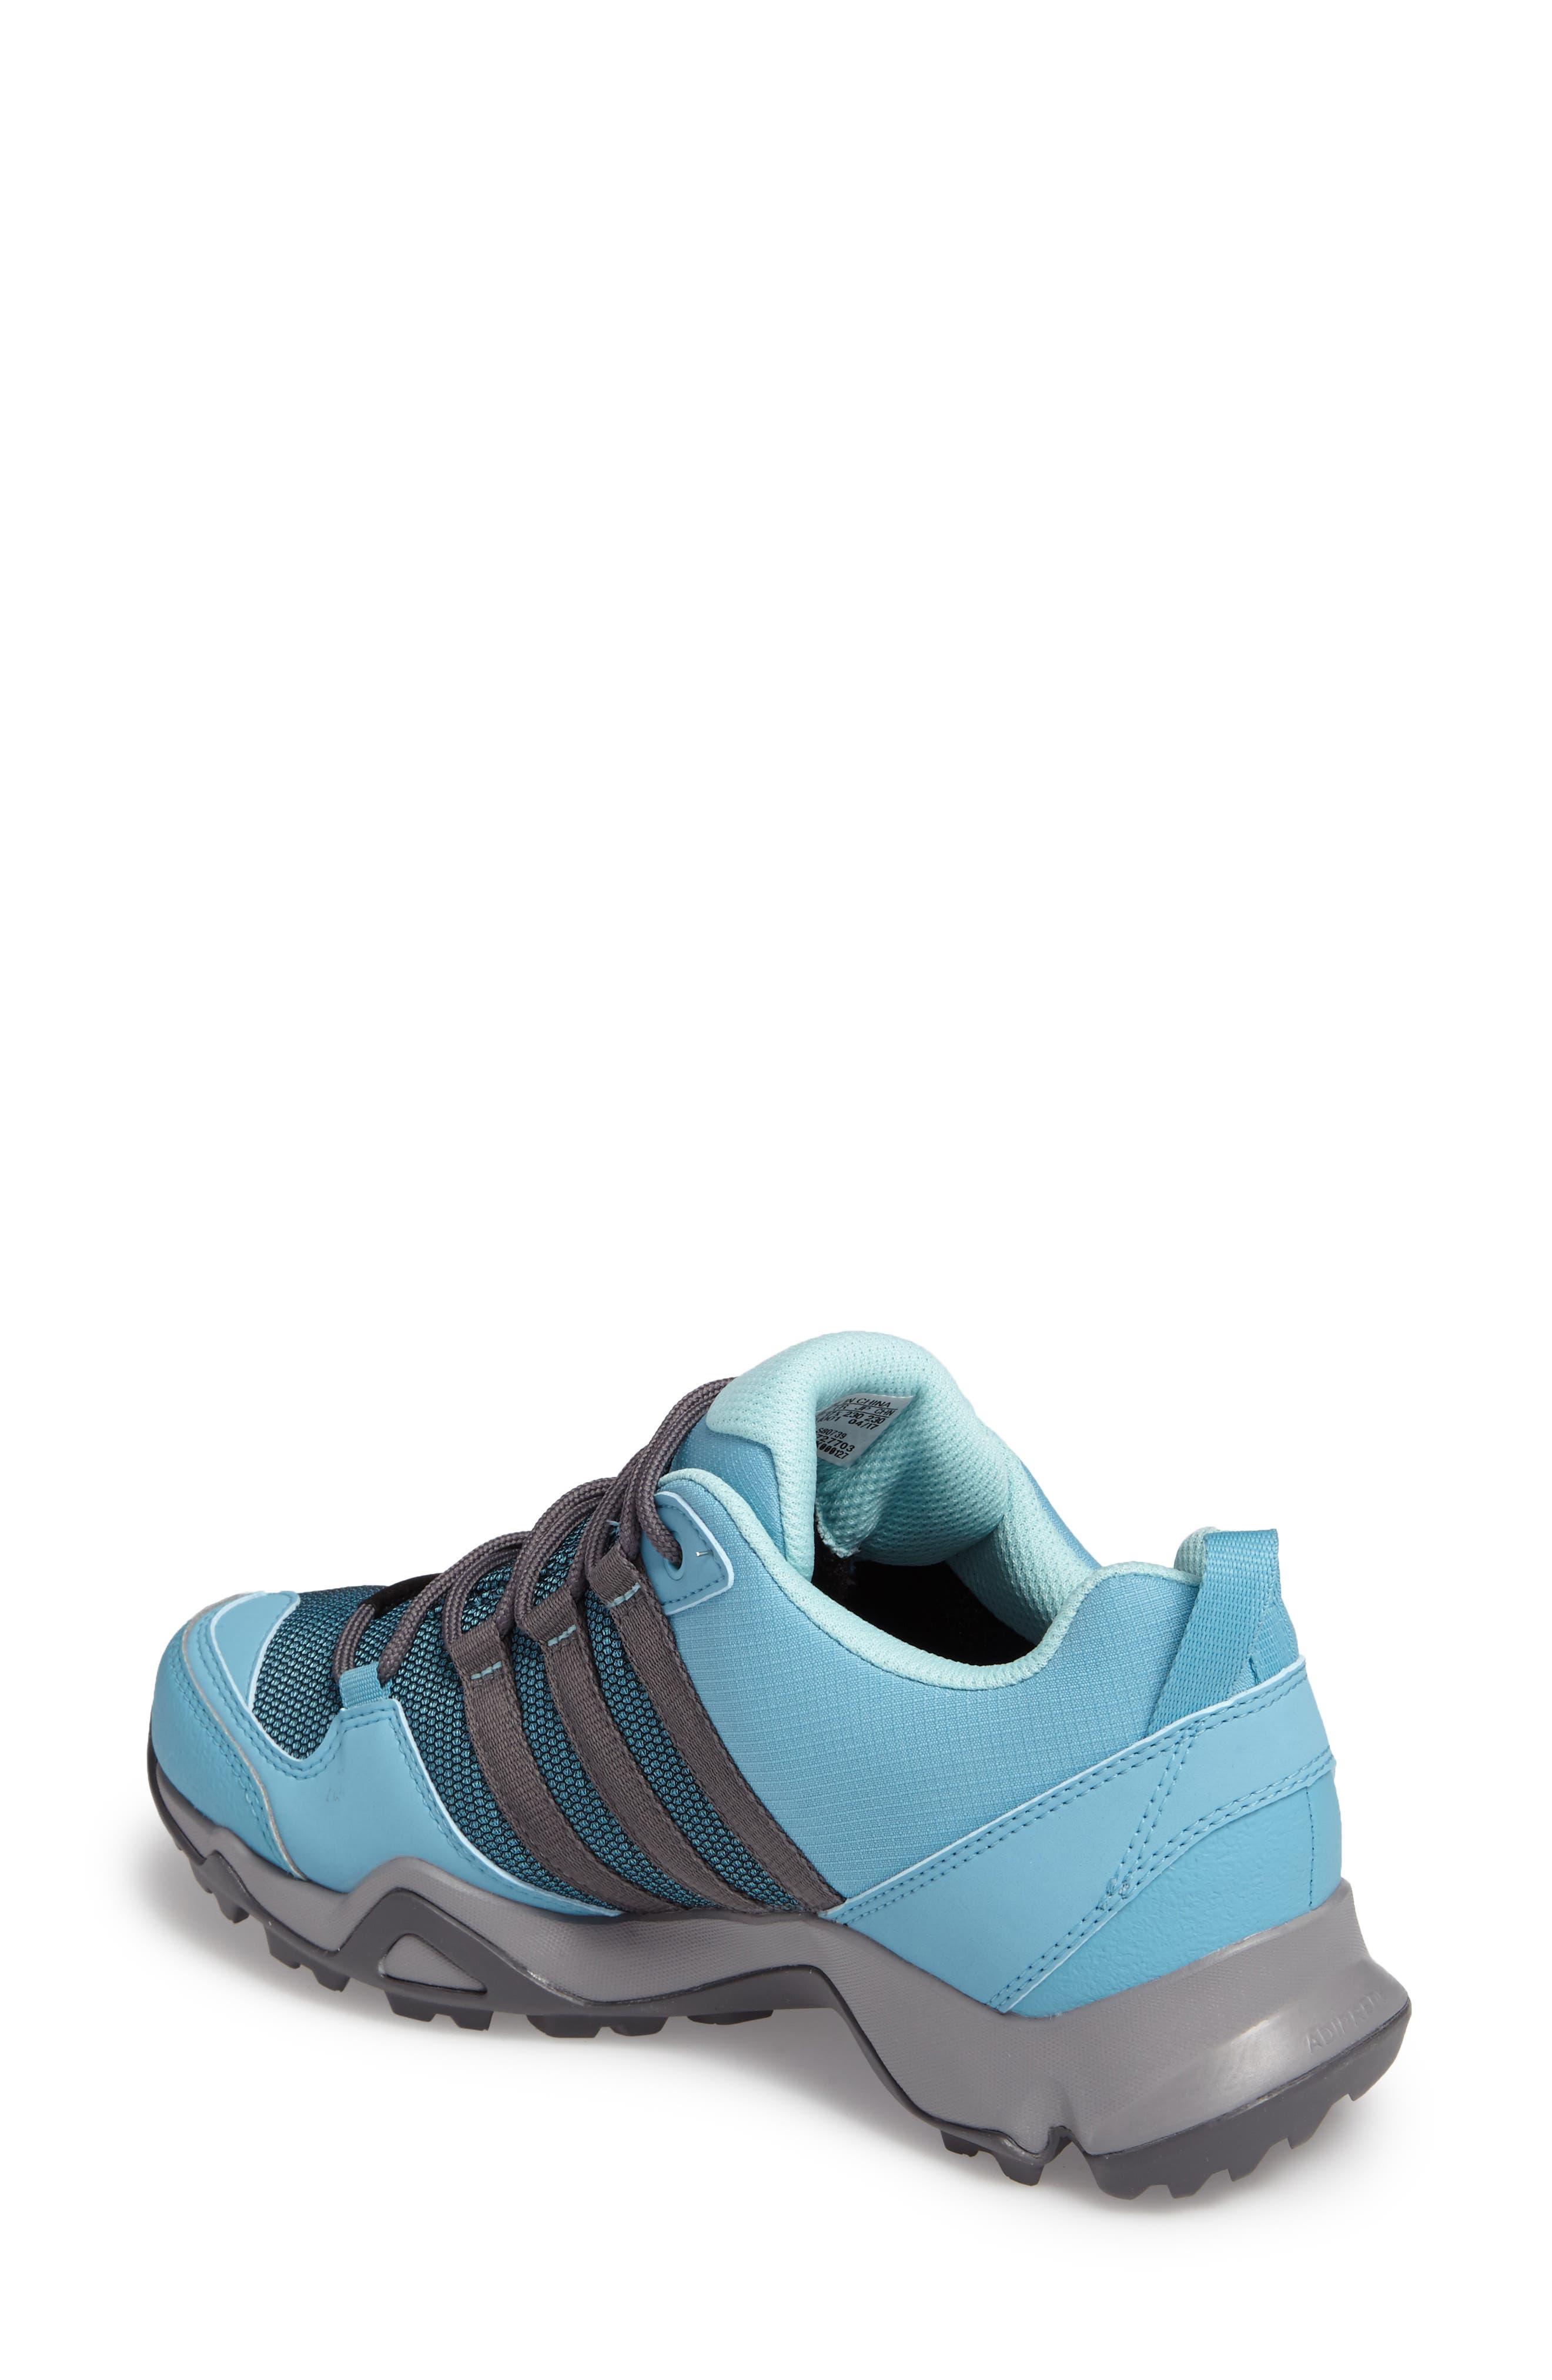 Alternate Image 2  - adidas 'AX2' Waterproof Hiking Shoe (Women)